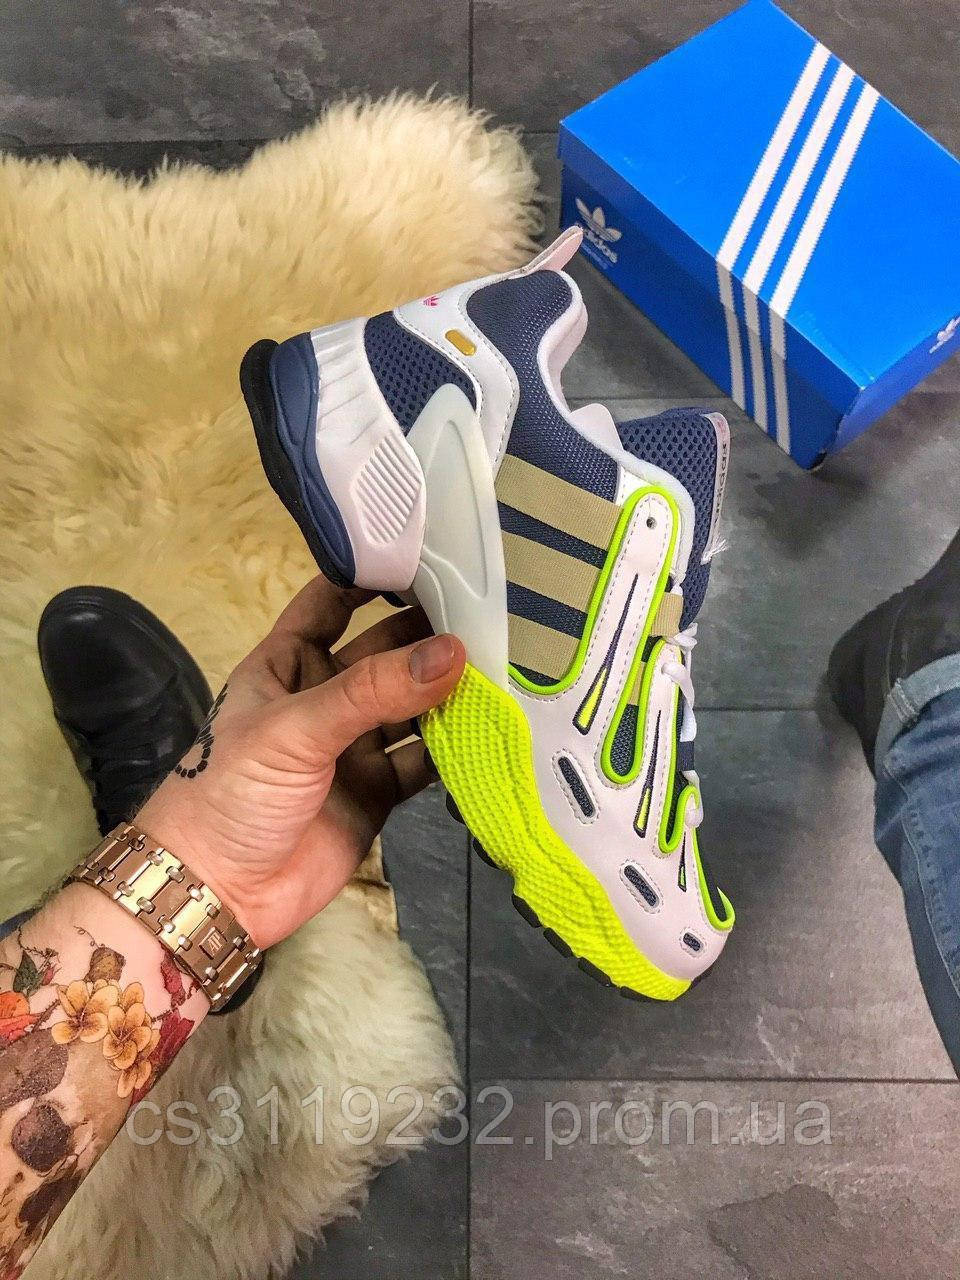 Чоловічі кросівки Adidas EQT Gazelle Collegiate Navy White Gold